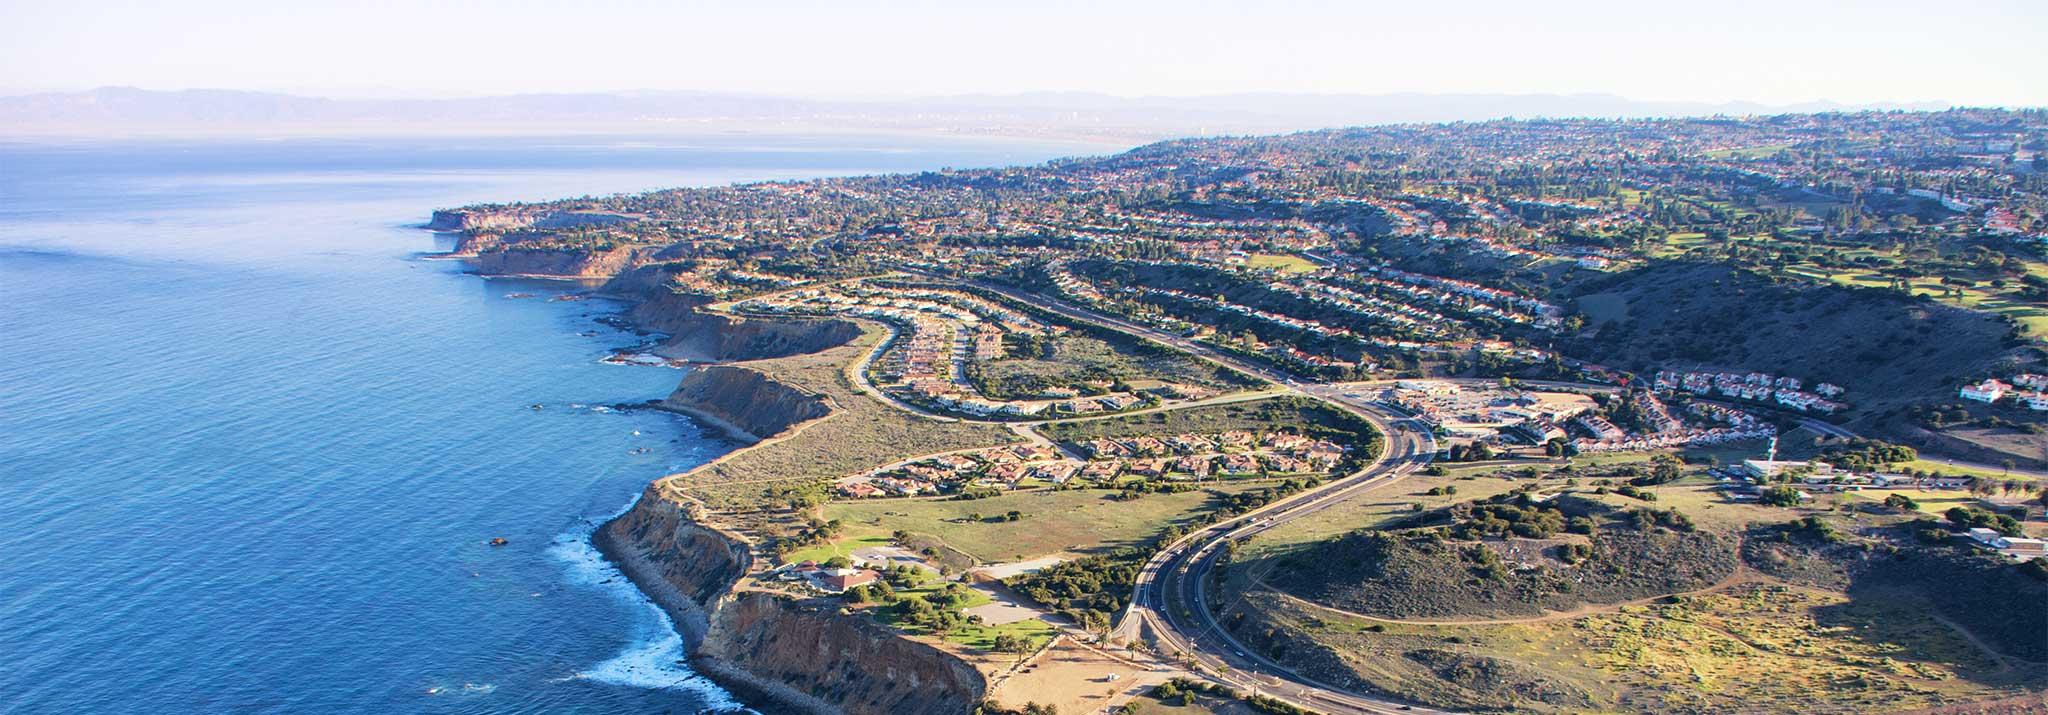 rajat-parr-wine-club-california-usa-wines-natural